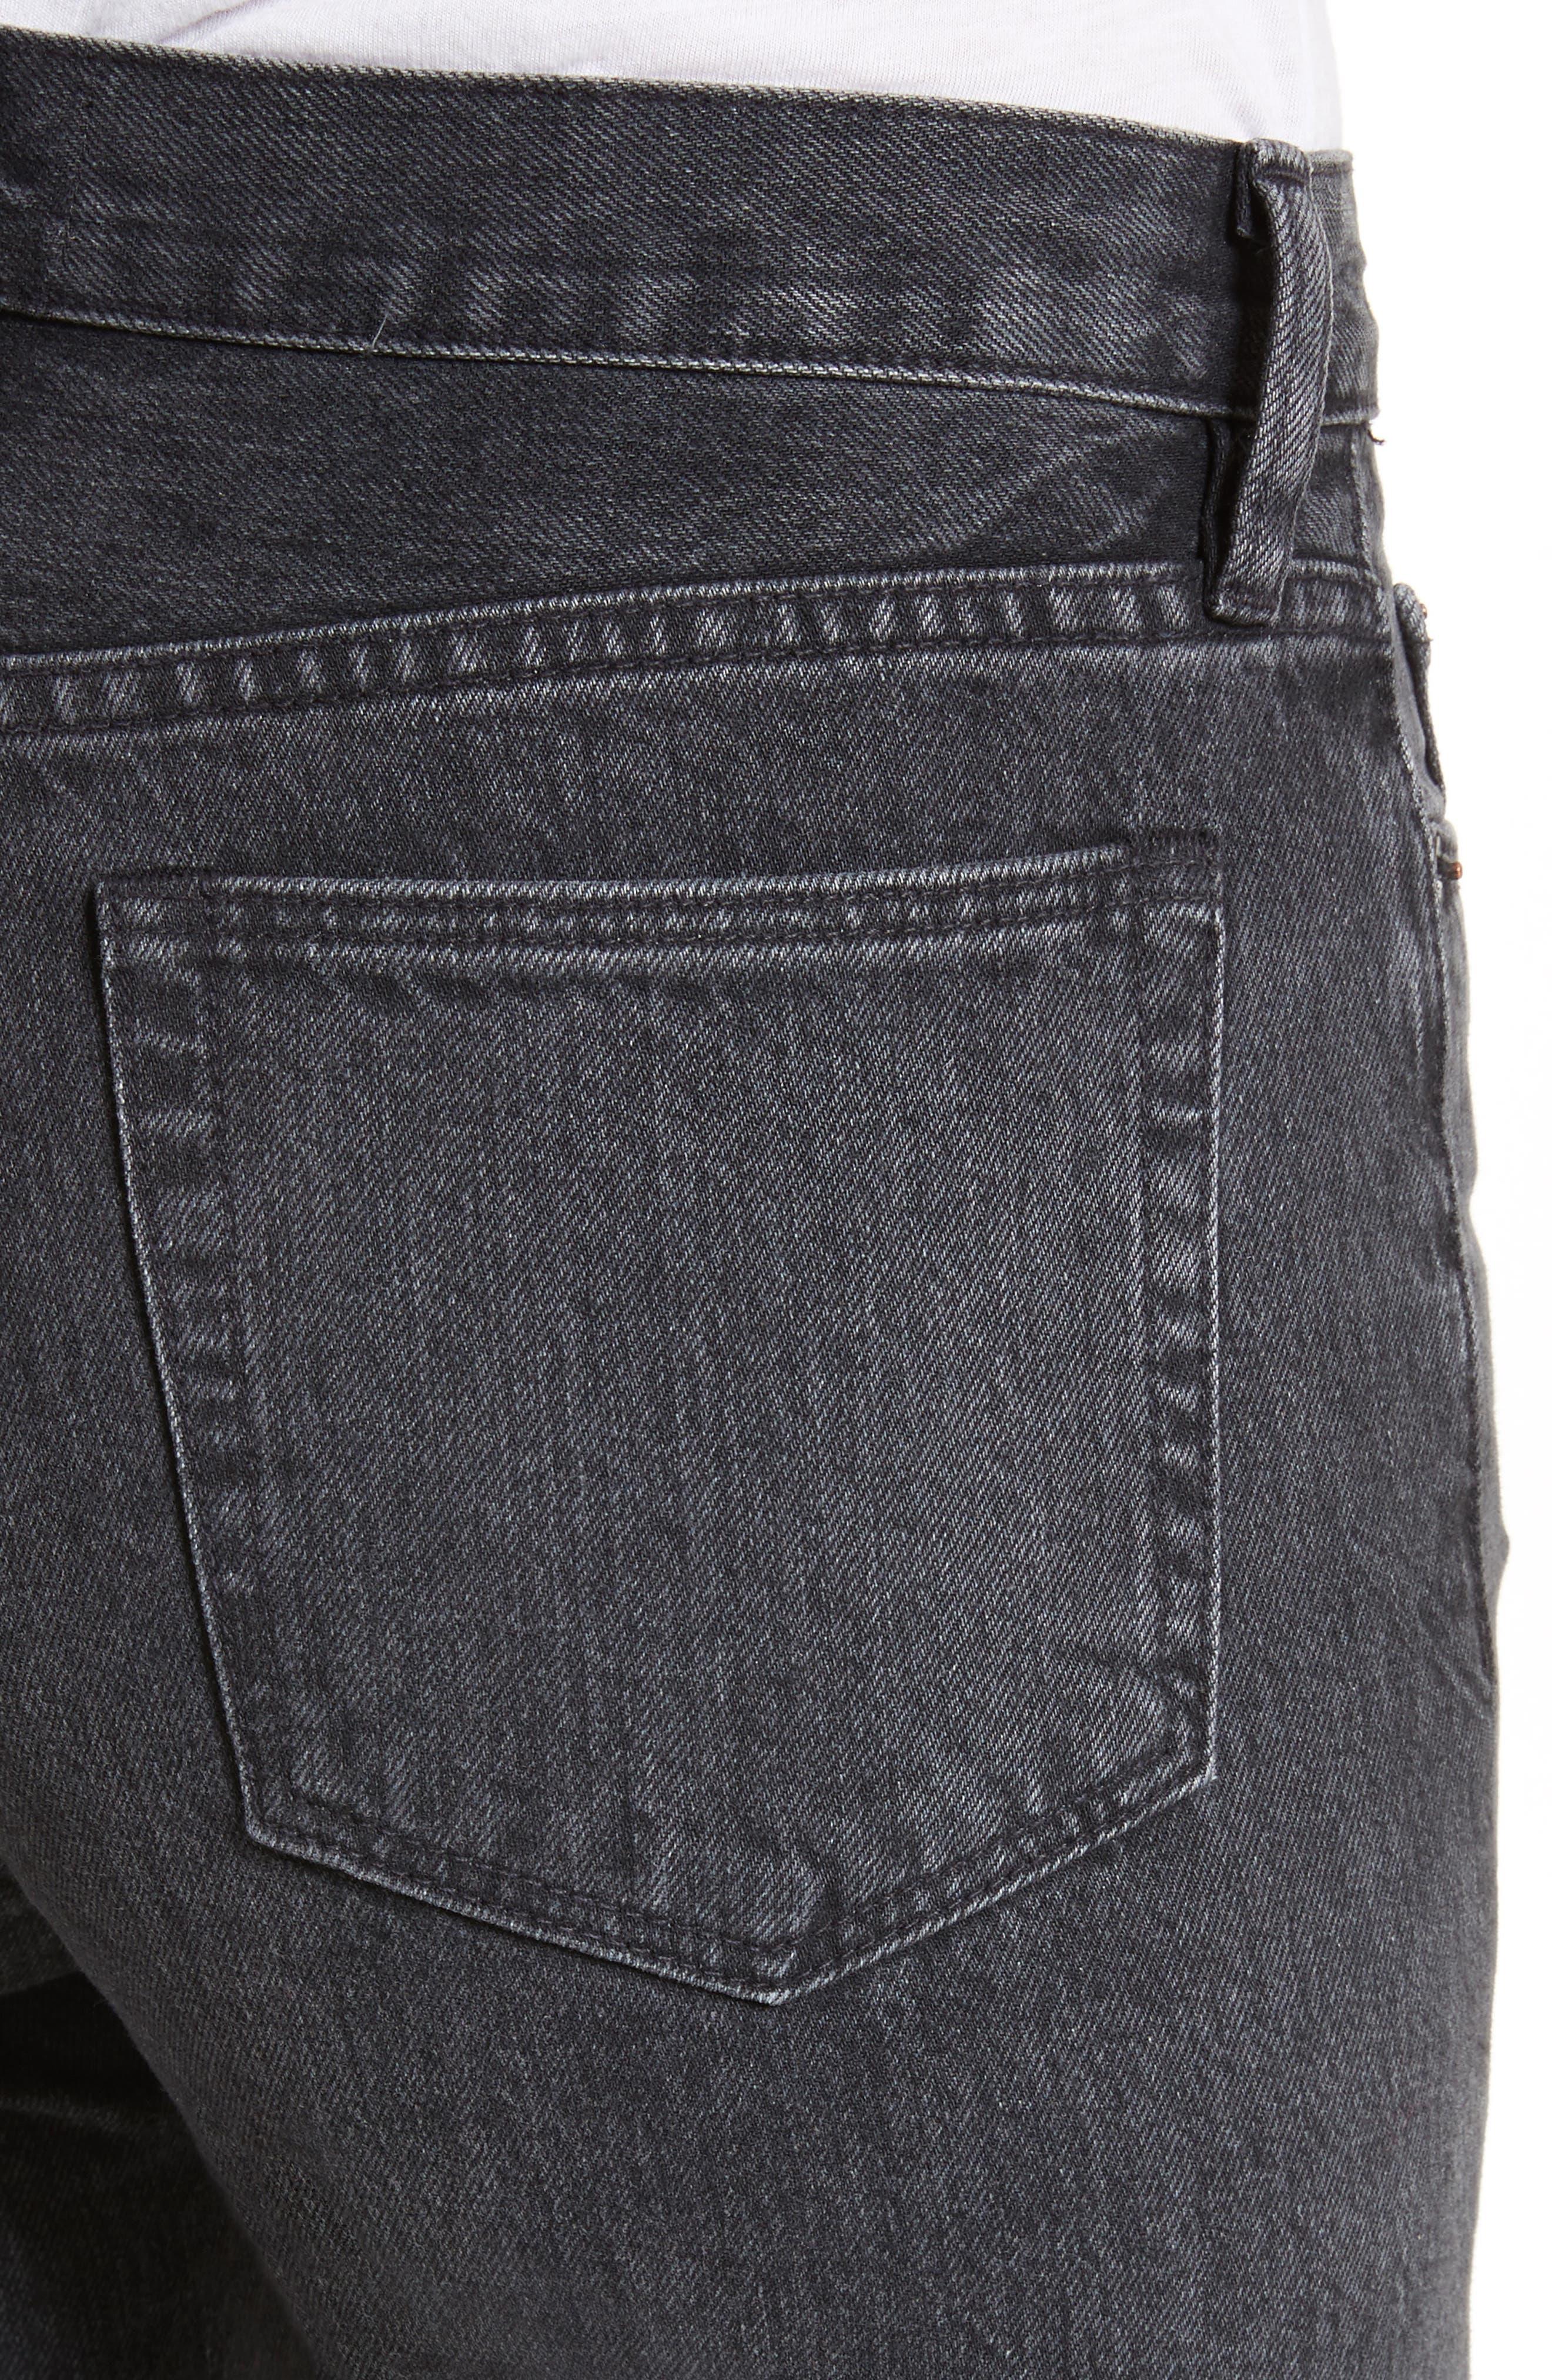 Tilson Crop Frayed Wide Leg Jeans,                             Alternate thumbnail 4, color,                             001